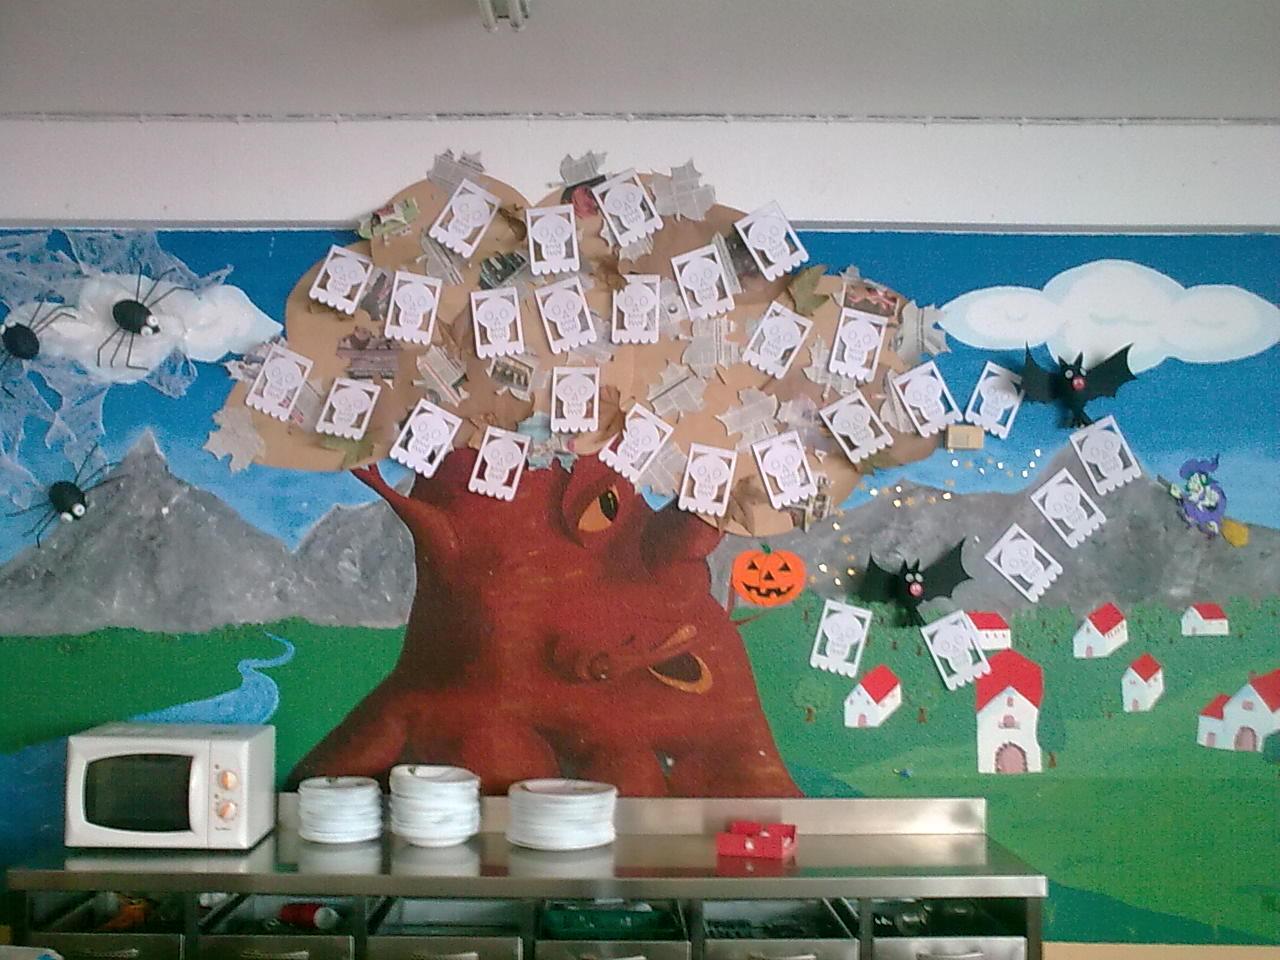 Como Decorar Un Mural Escolar Fotos Para Facebook | MEJOR CONJUNTO DE